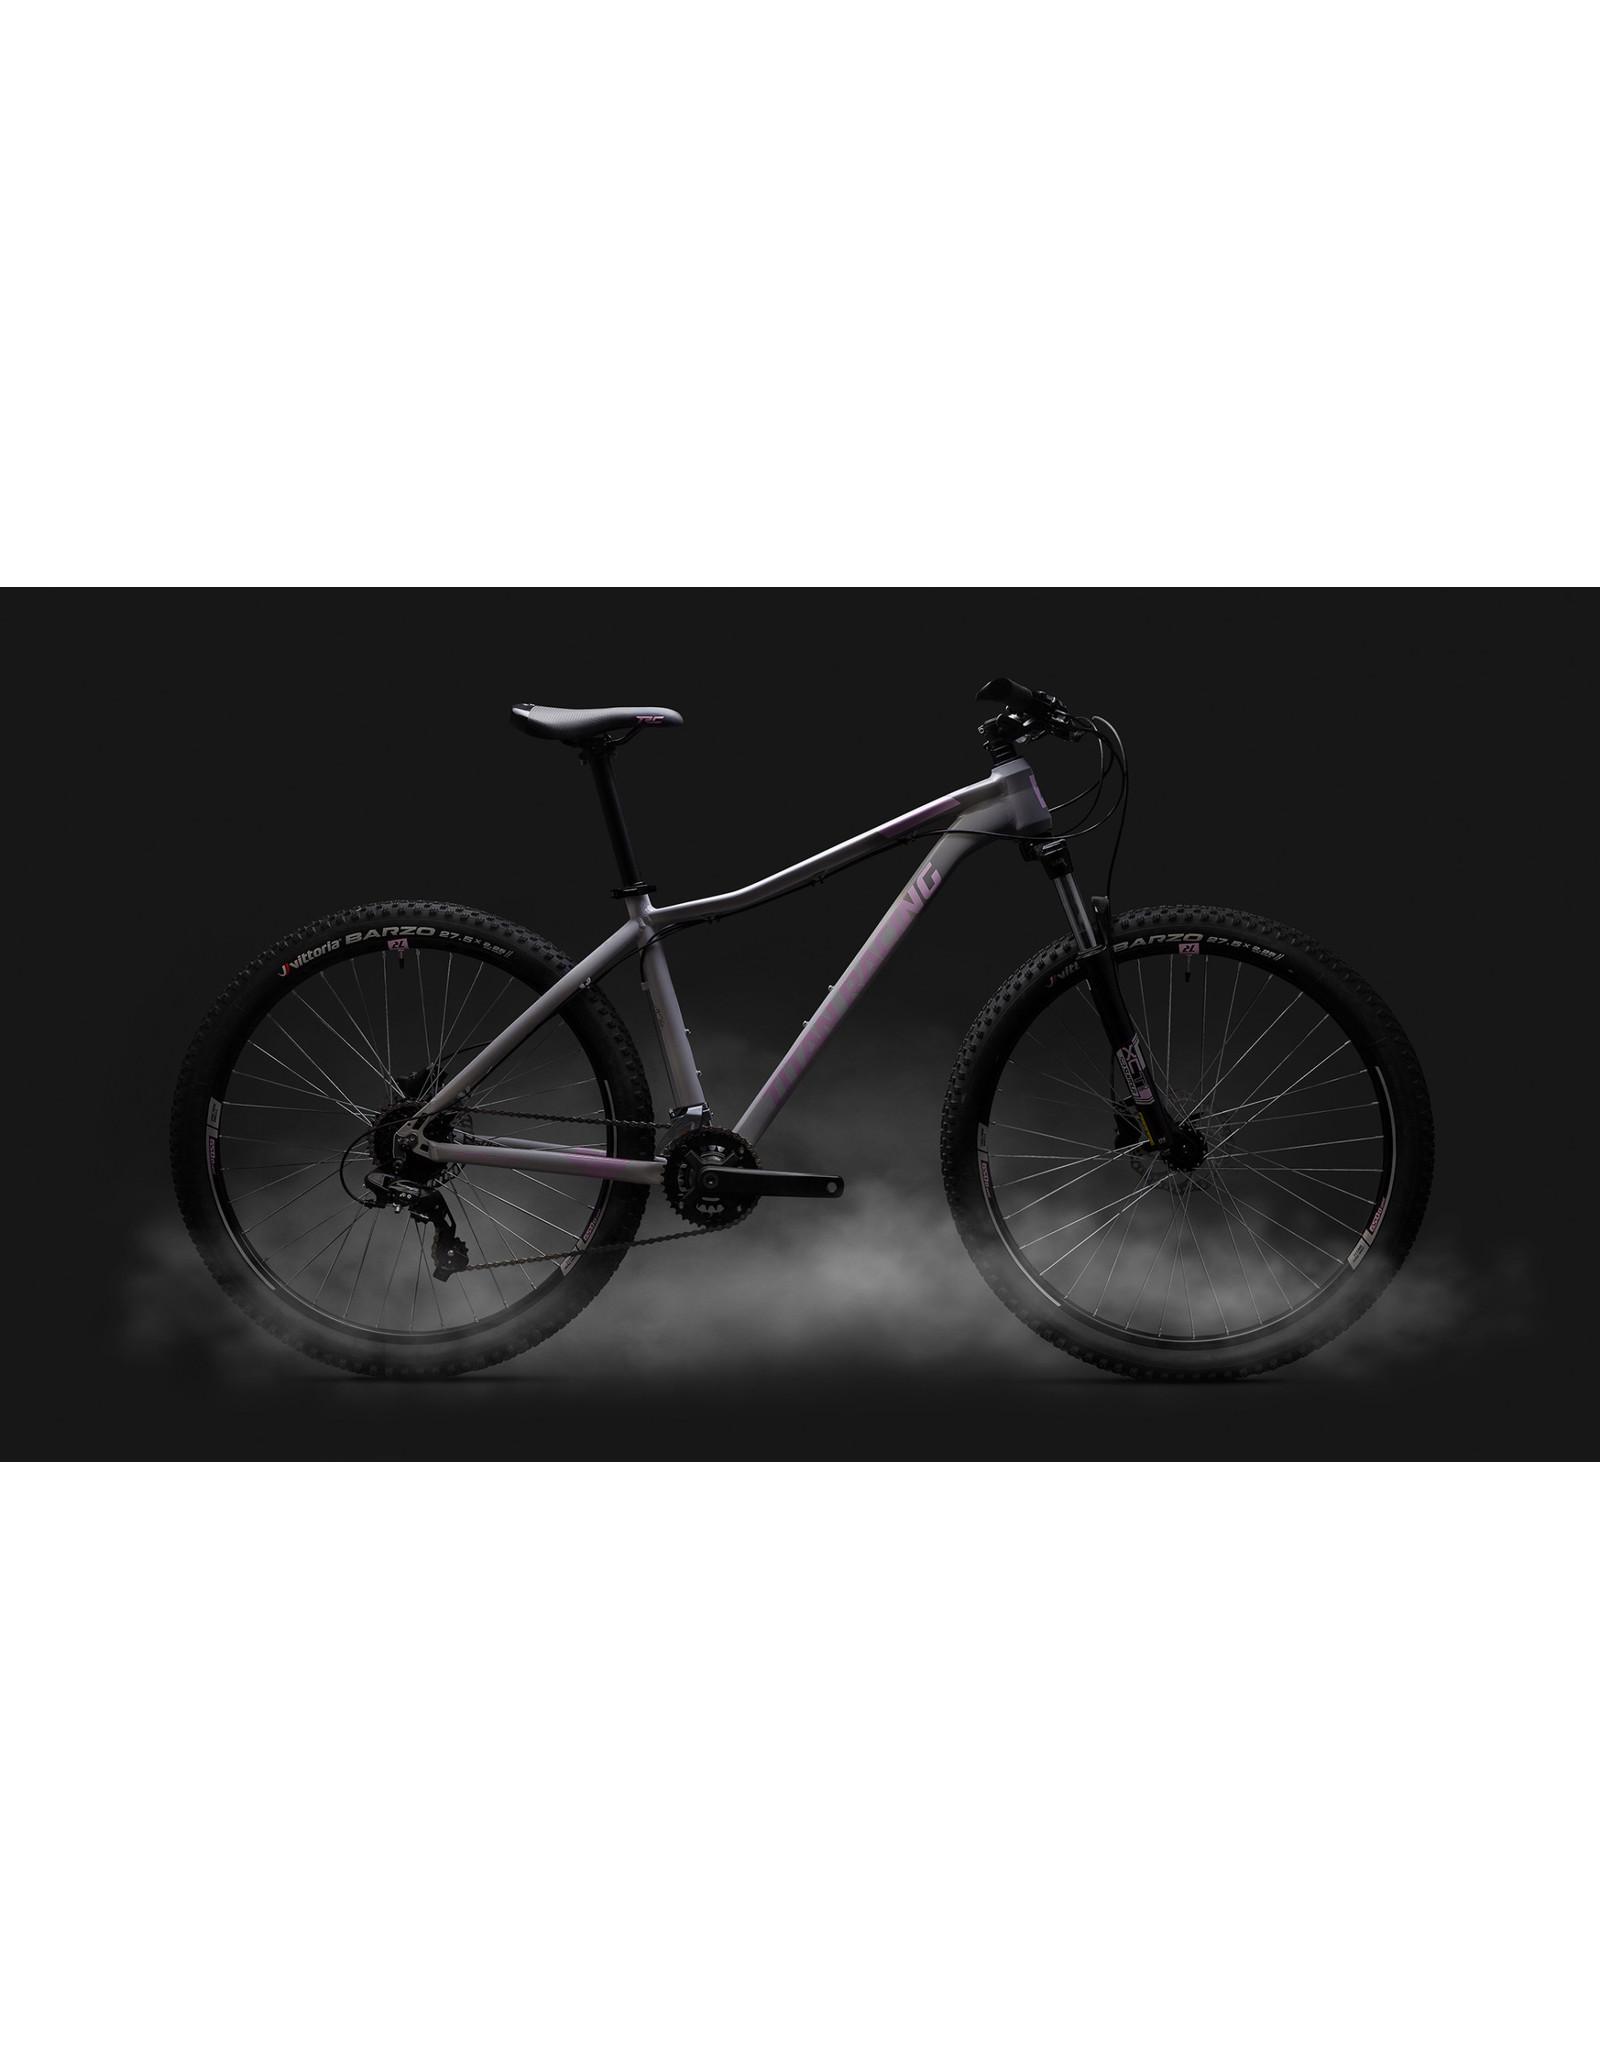 Titan Racing Rogue Calypso Ryde 2021